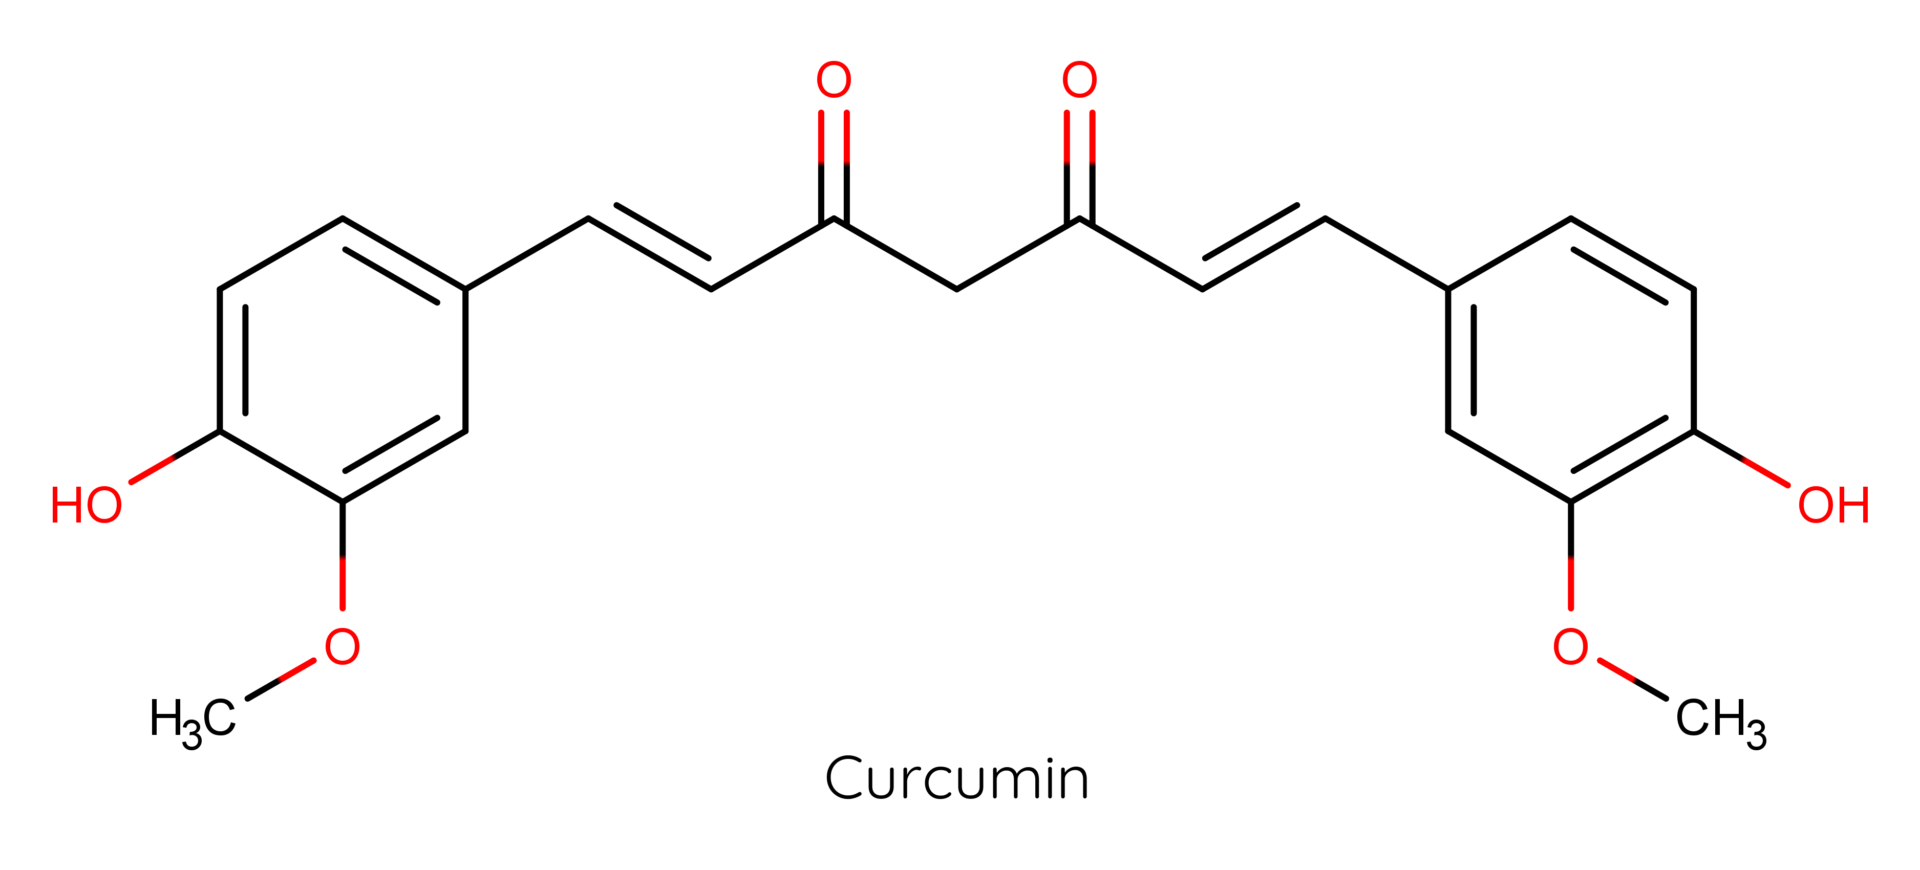 Molekül des sekundären Pflanzenstoffs Curcumin